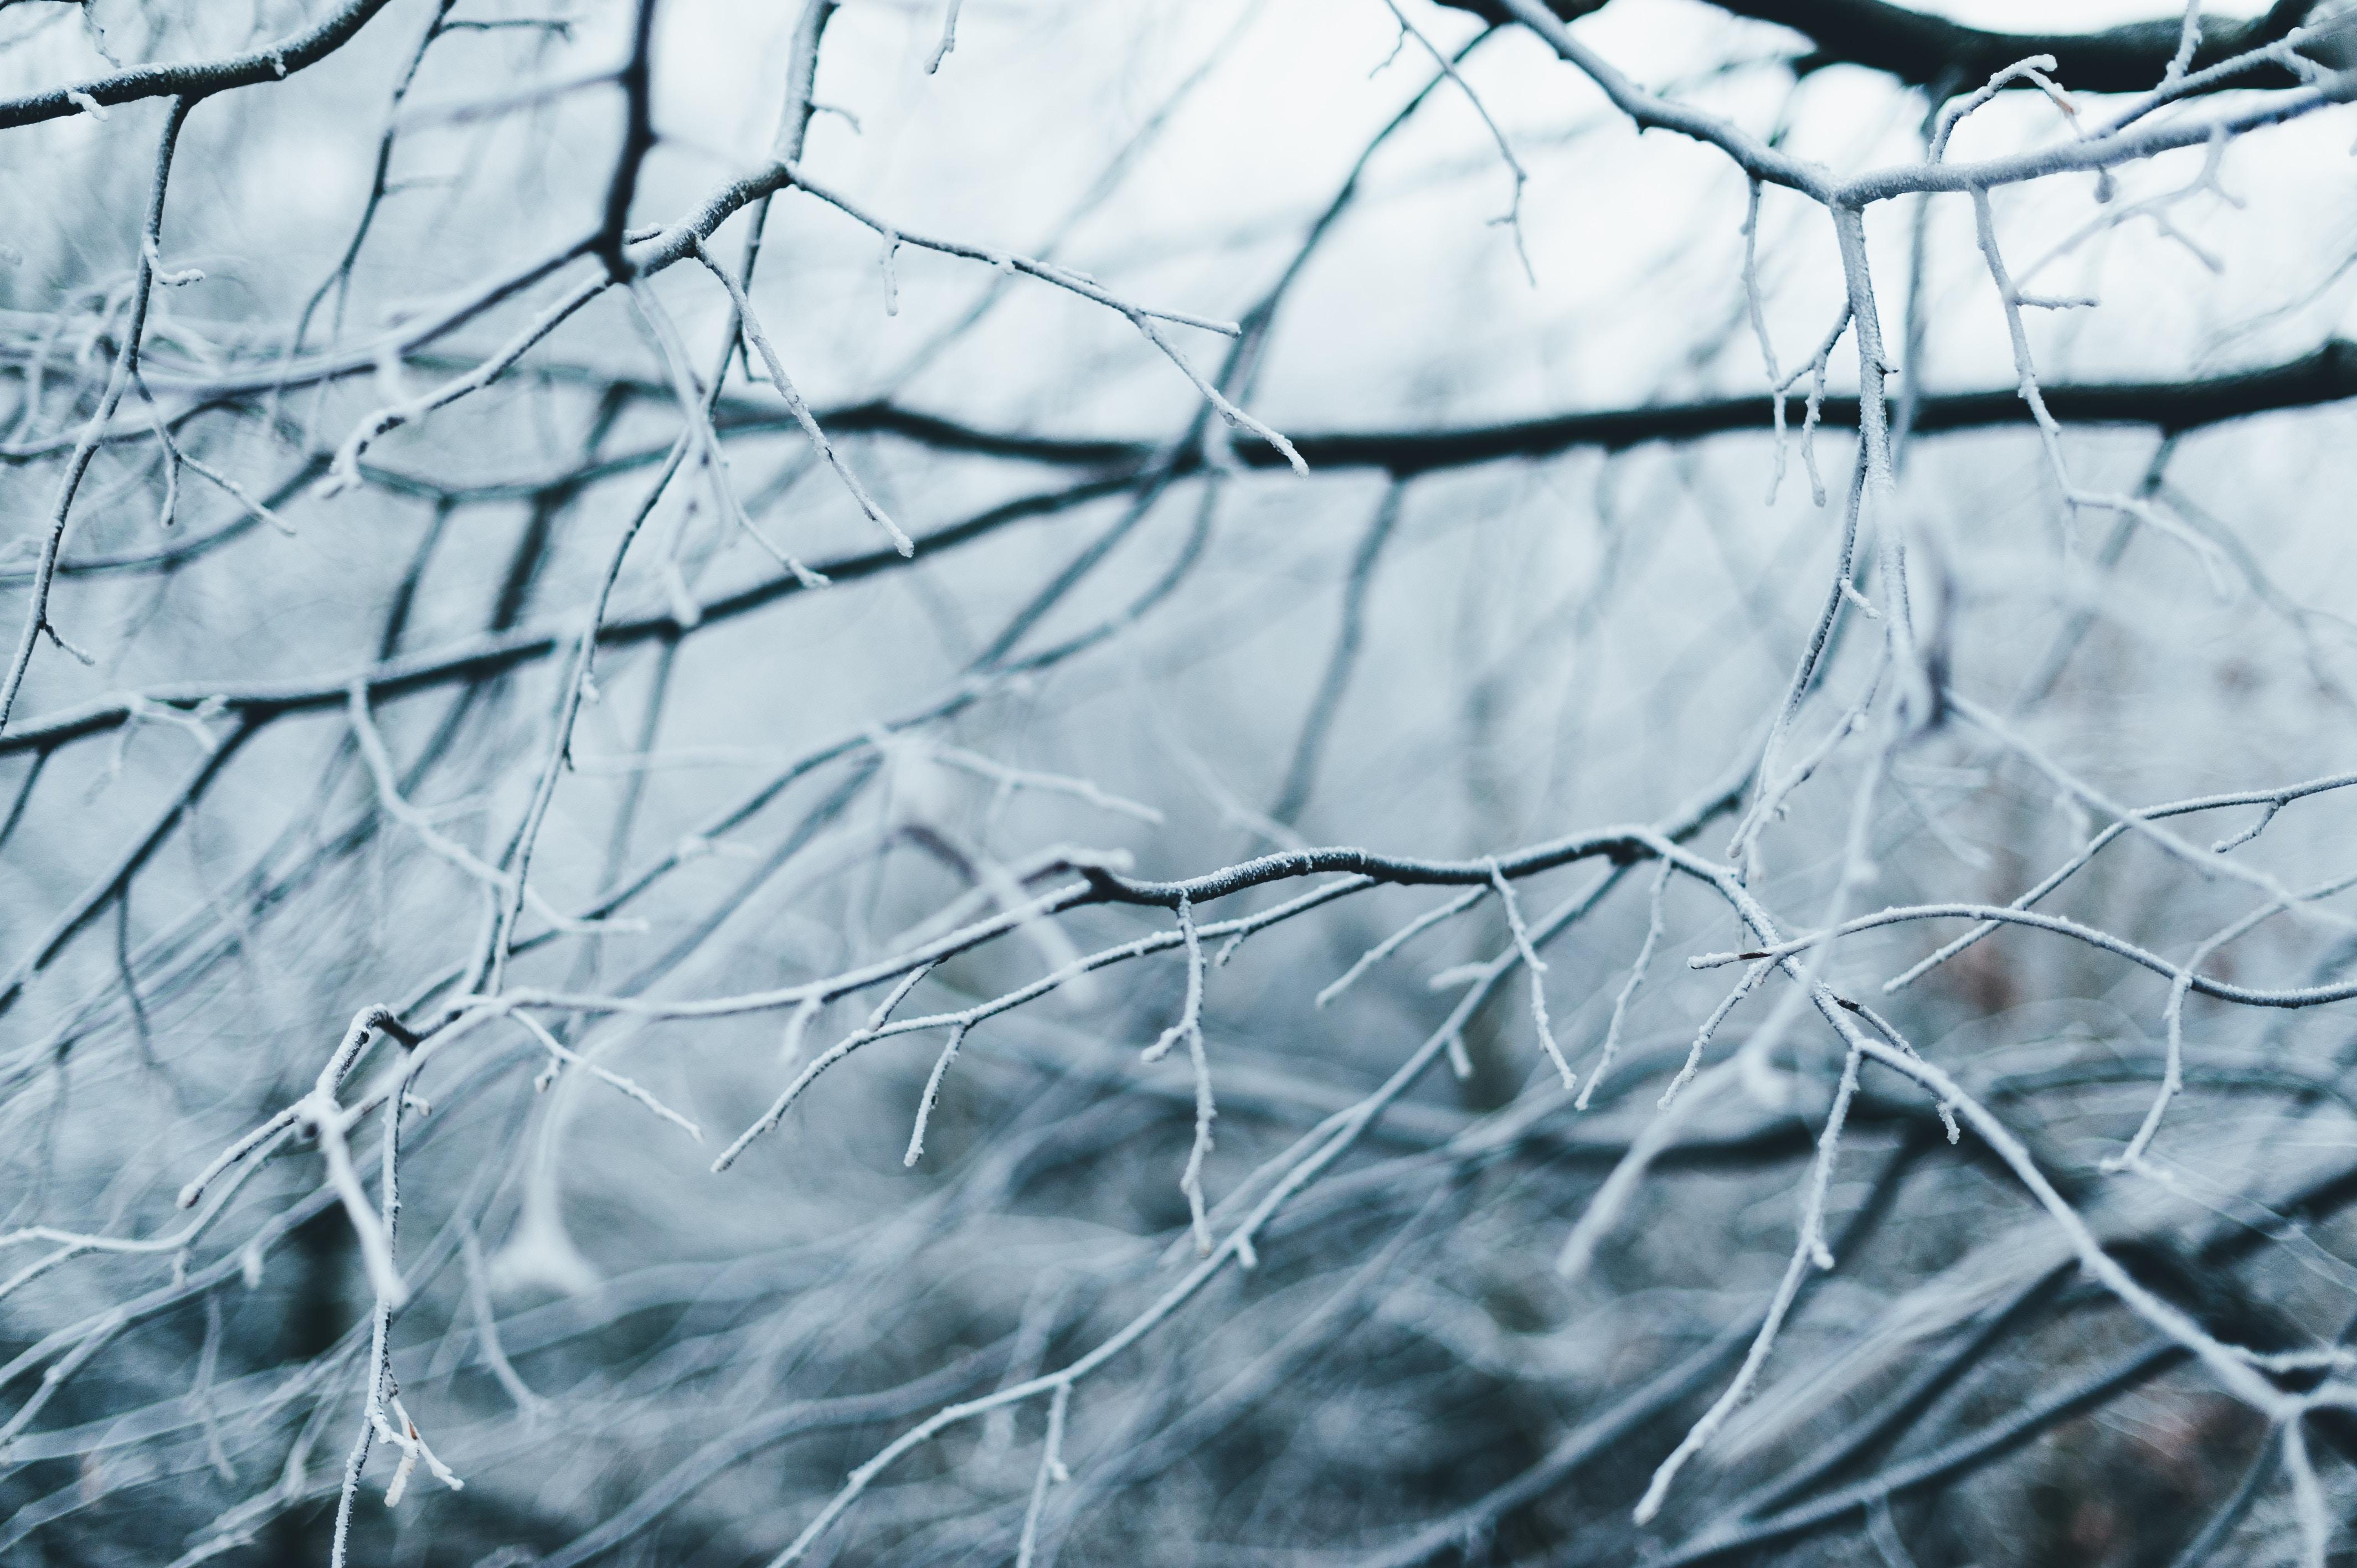 anna-popovic-167310-unsplash-winter-free